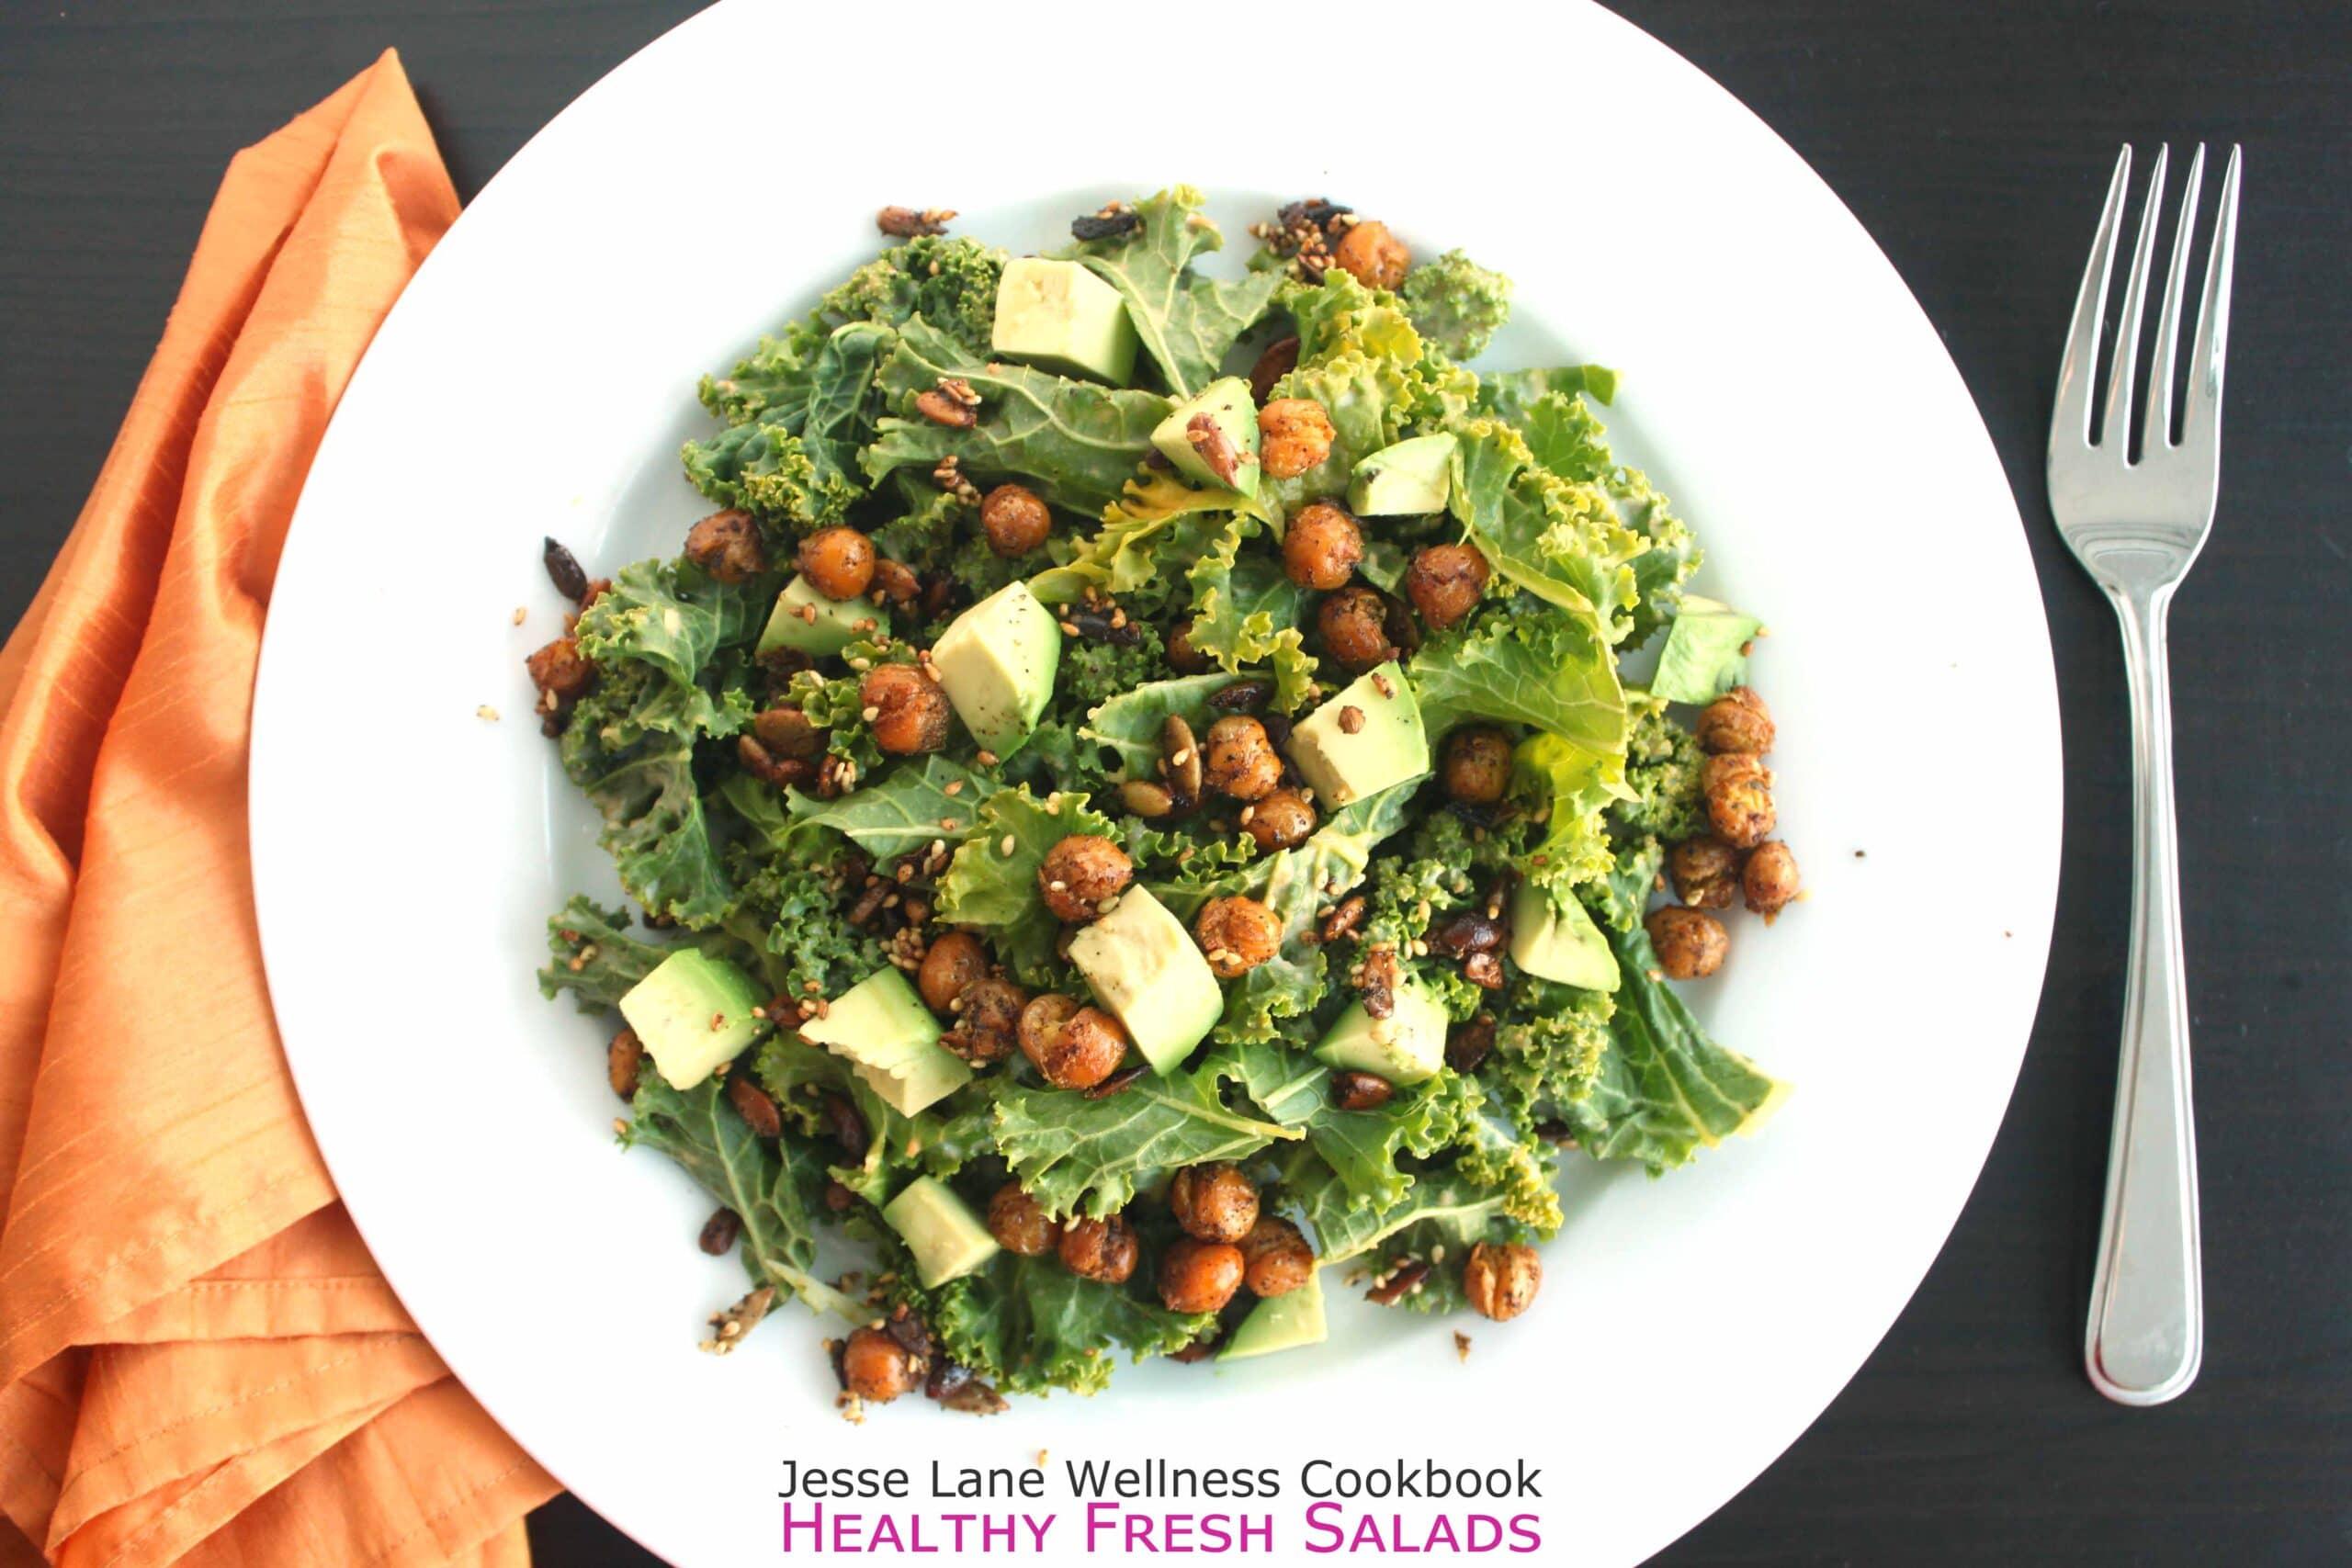 Kale Salad with Crispy Chickpeas from @jesselwellness cookbook Healthy Fresh Salads #kale